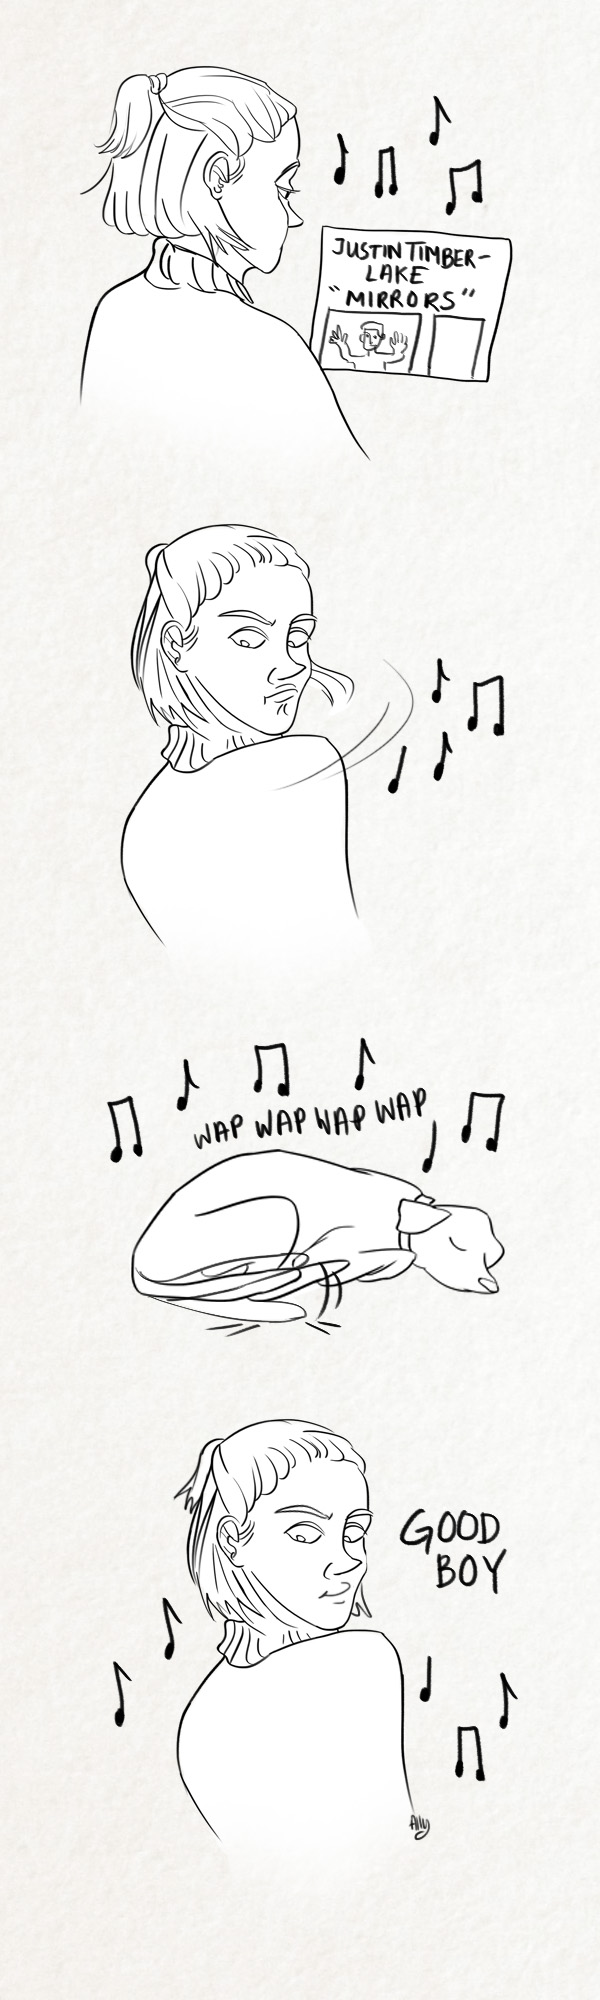 dog music (1)